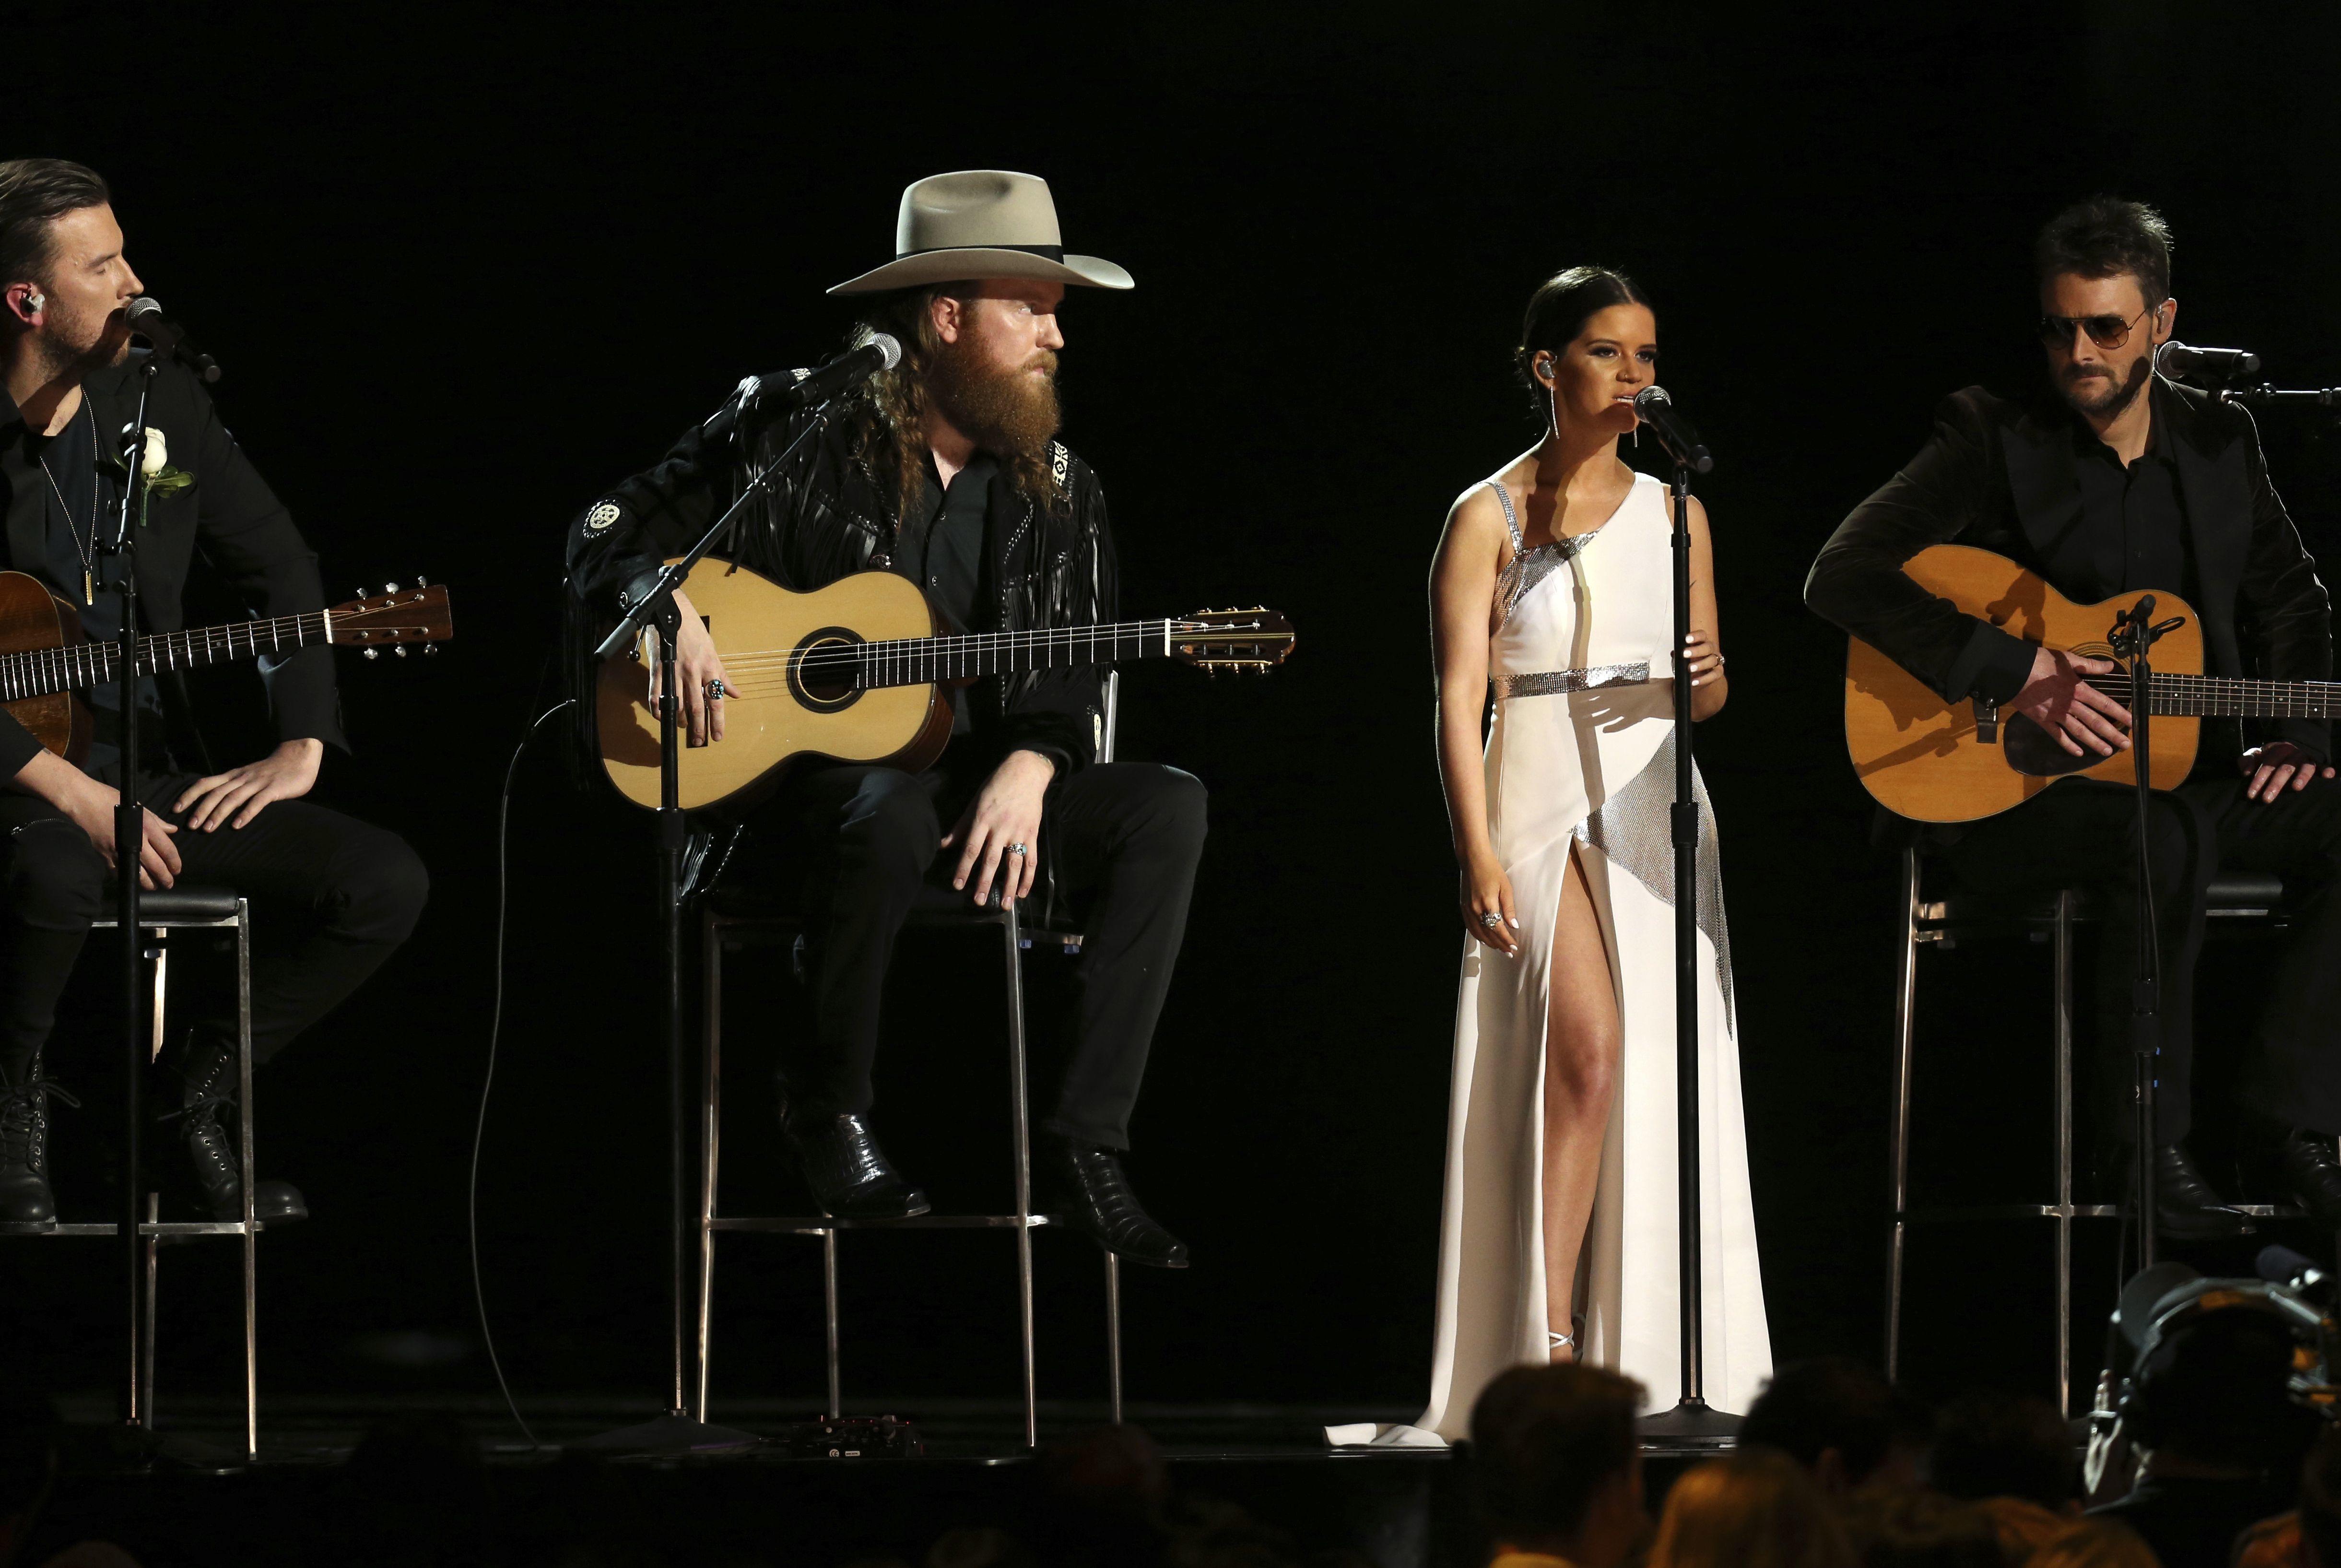 "T.J. Osborne, John Osborne, Maren Morris and Eric Church perform ""Tears In Heaven"" at the 60th Annual Grammy Awards at Madison Square Garden in New York City on Jan. 28, 2018."